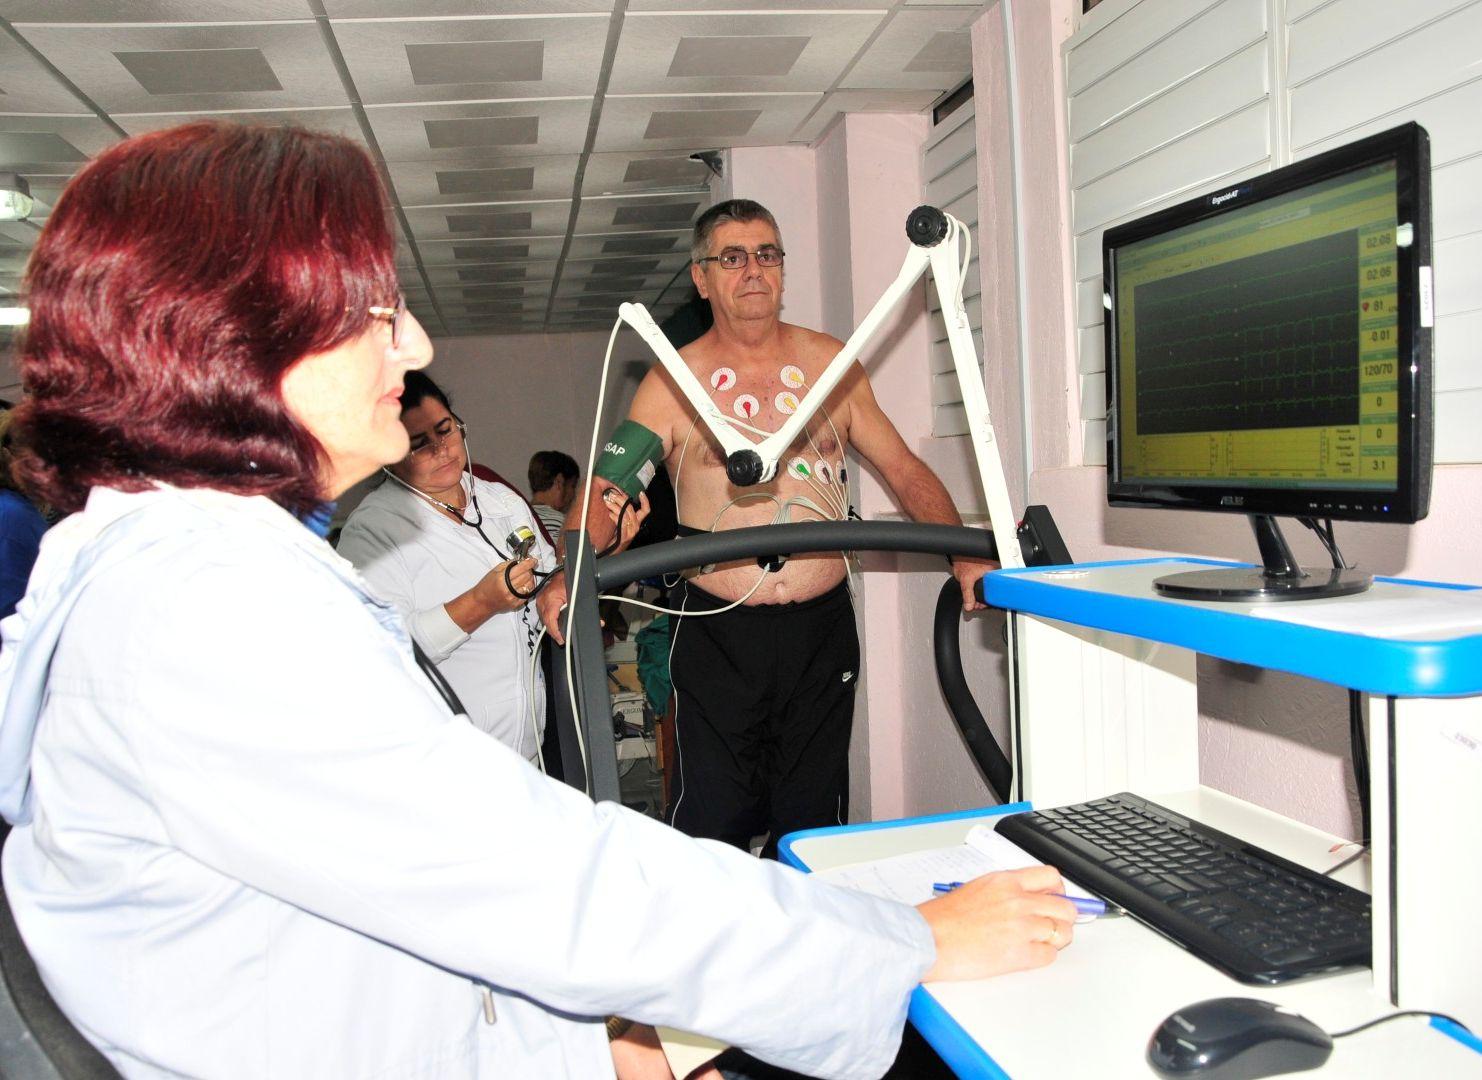 sancti spiritus, rehabilitacion, hospital provincial camilo cienfuegos, salud publica, gimnasio de rehabilitacion cardiovascular